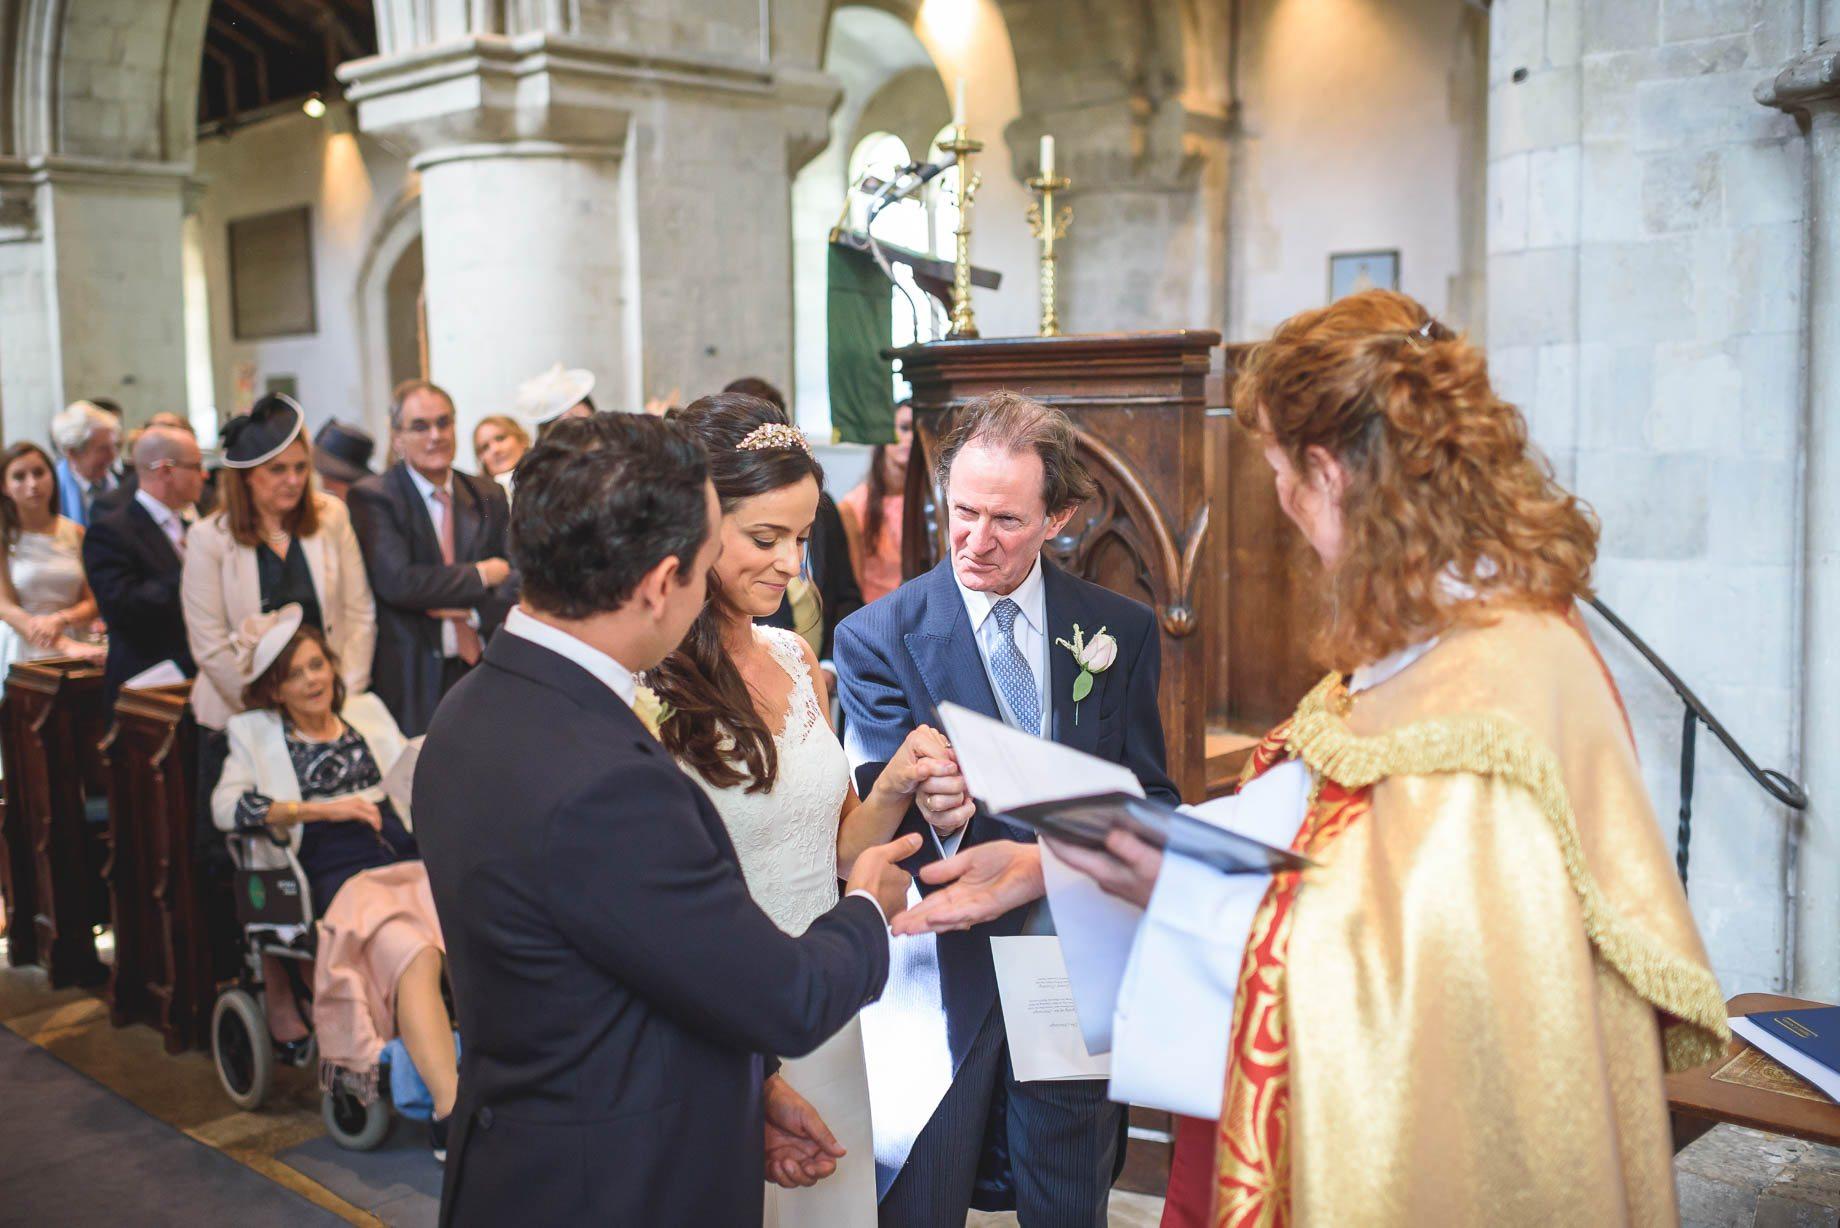 Bury Court Barn Wedding Photography - Caroline and Rob (58 of 219)